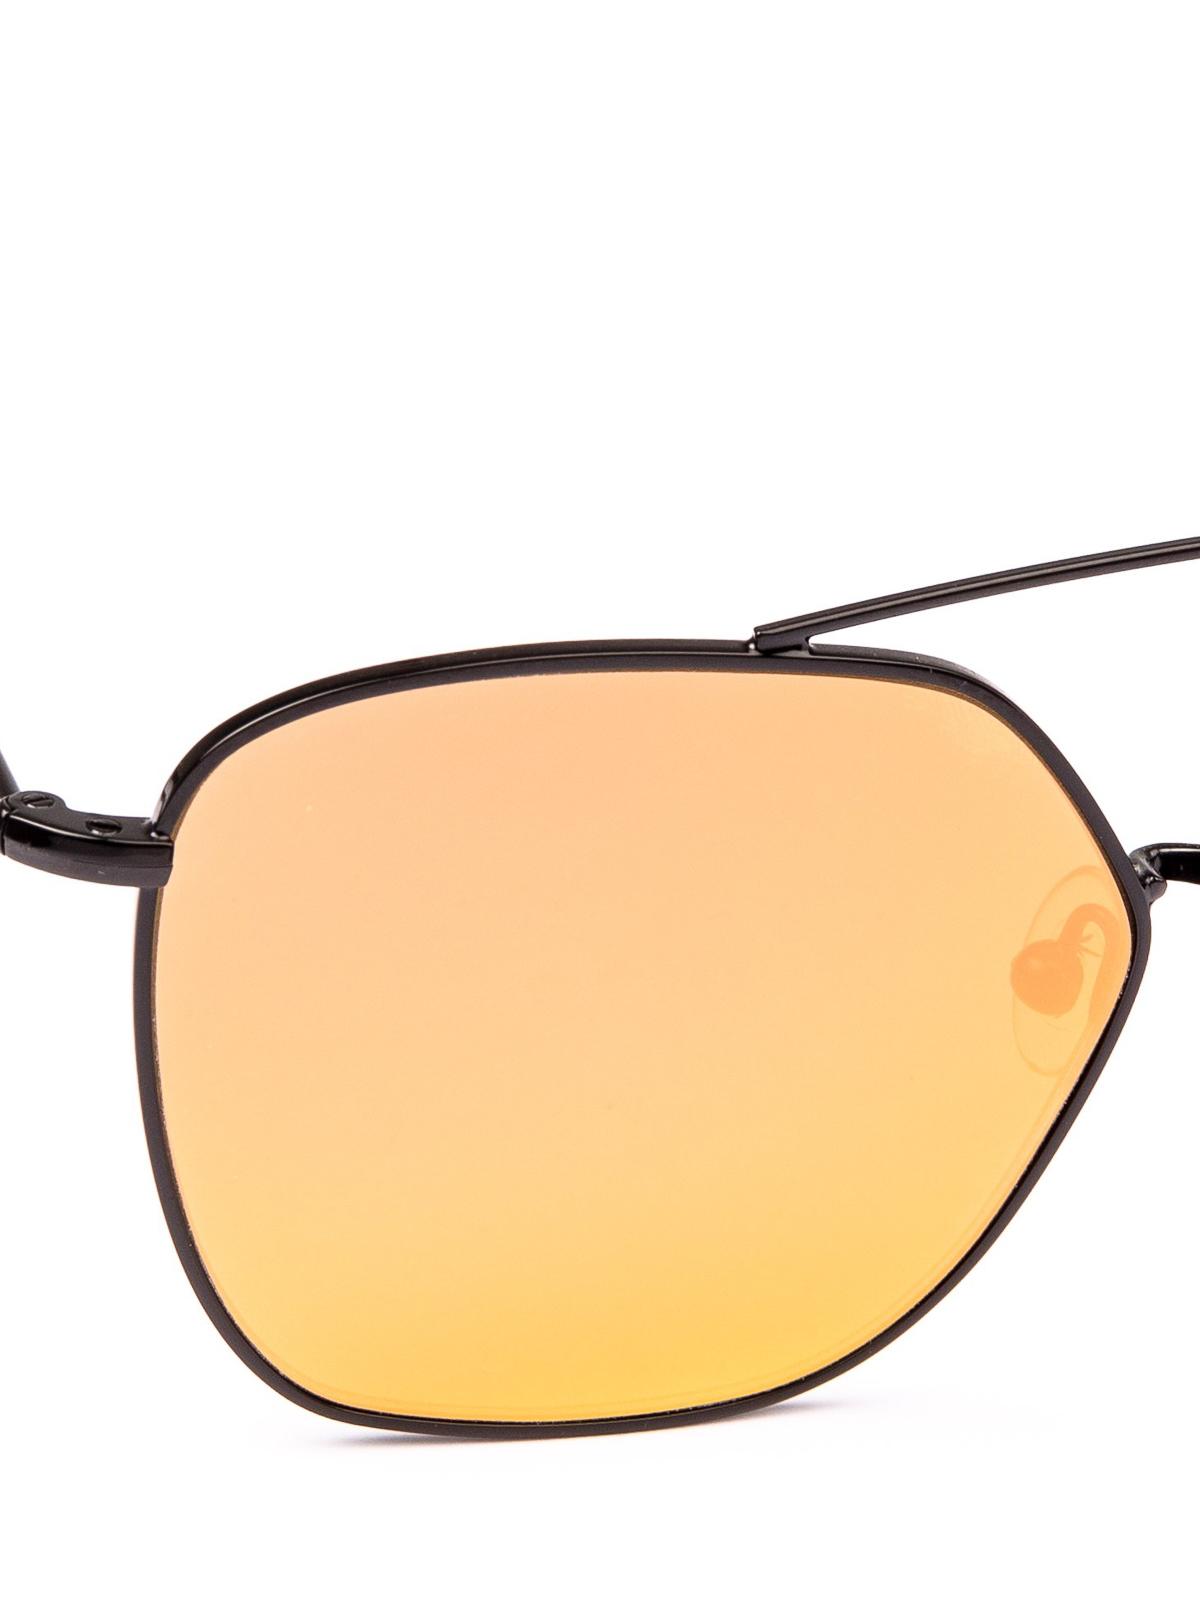 7727d073a3503a iKRIX SPEKTRE  sunglasses - Dolcevita yellow lens black frame sunglasses